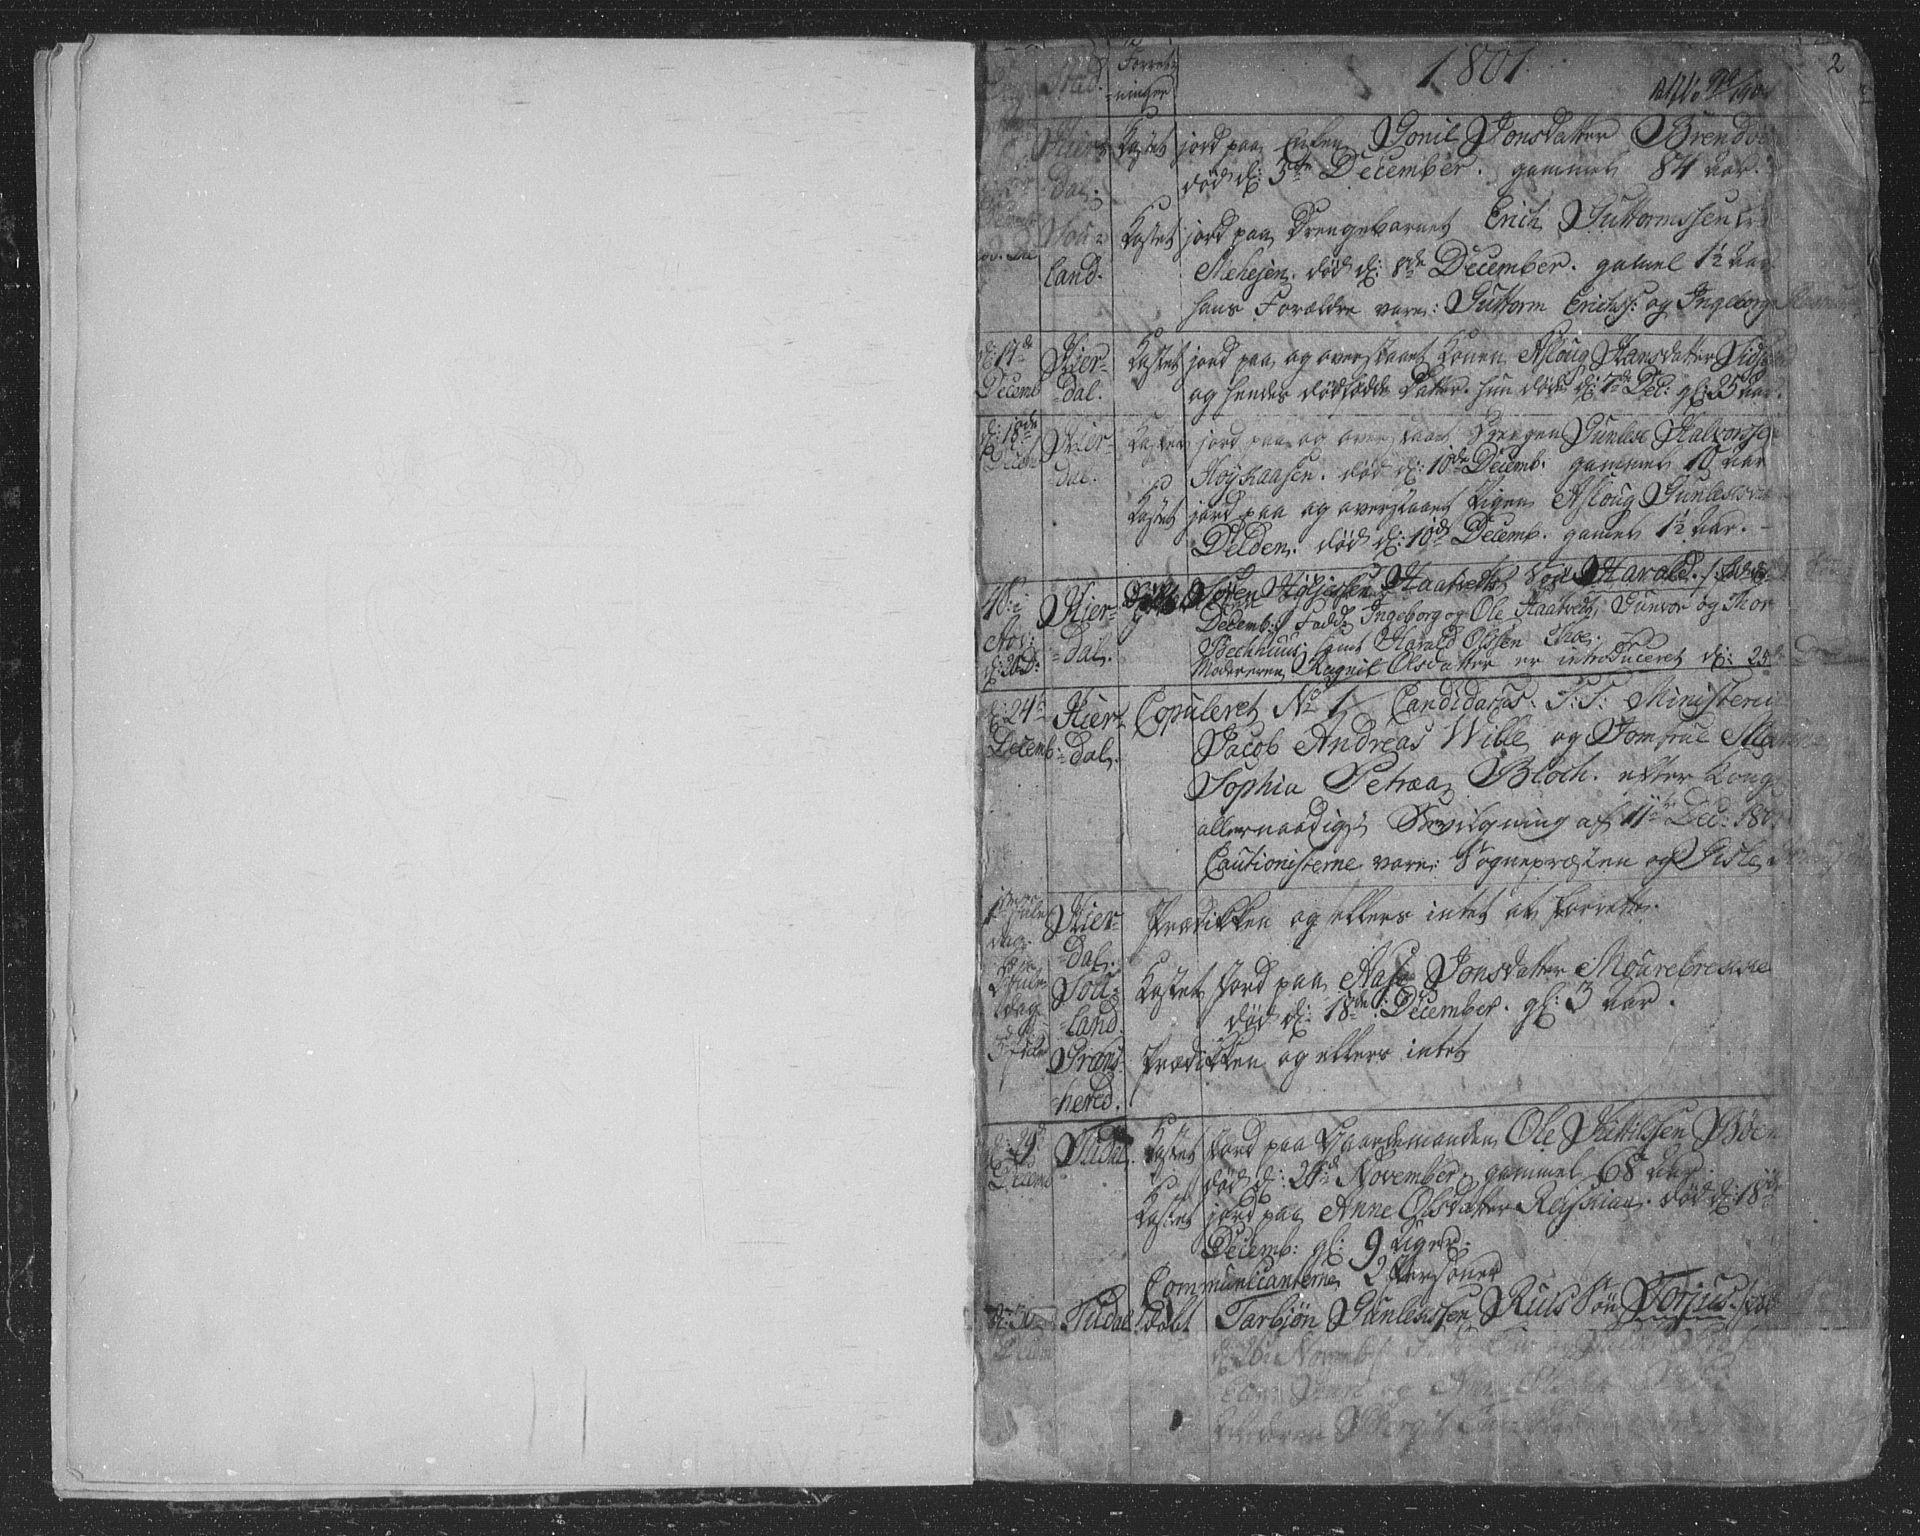 SAKO, Hjartdal kirkebøker, F/Fa/L0006: Ministerialbok nr. I 6, 1801-1814, s. 2